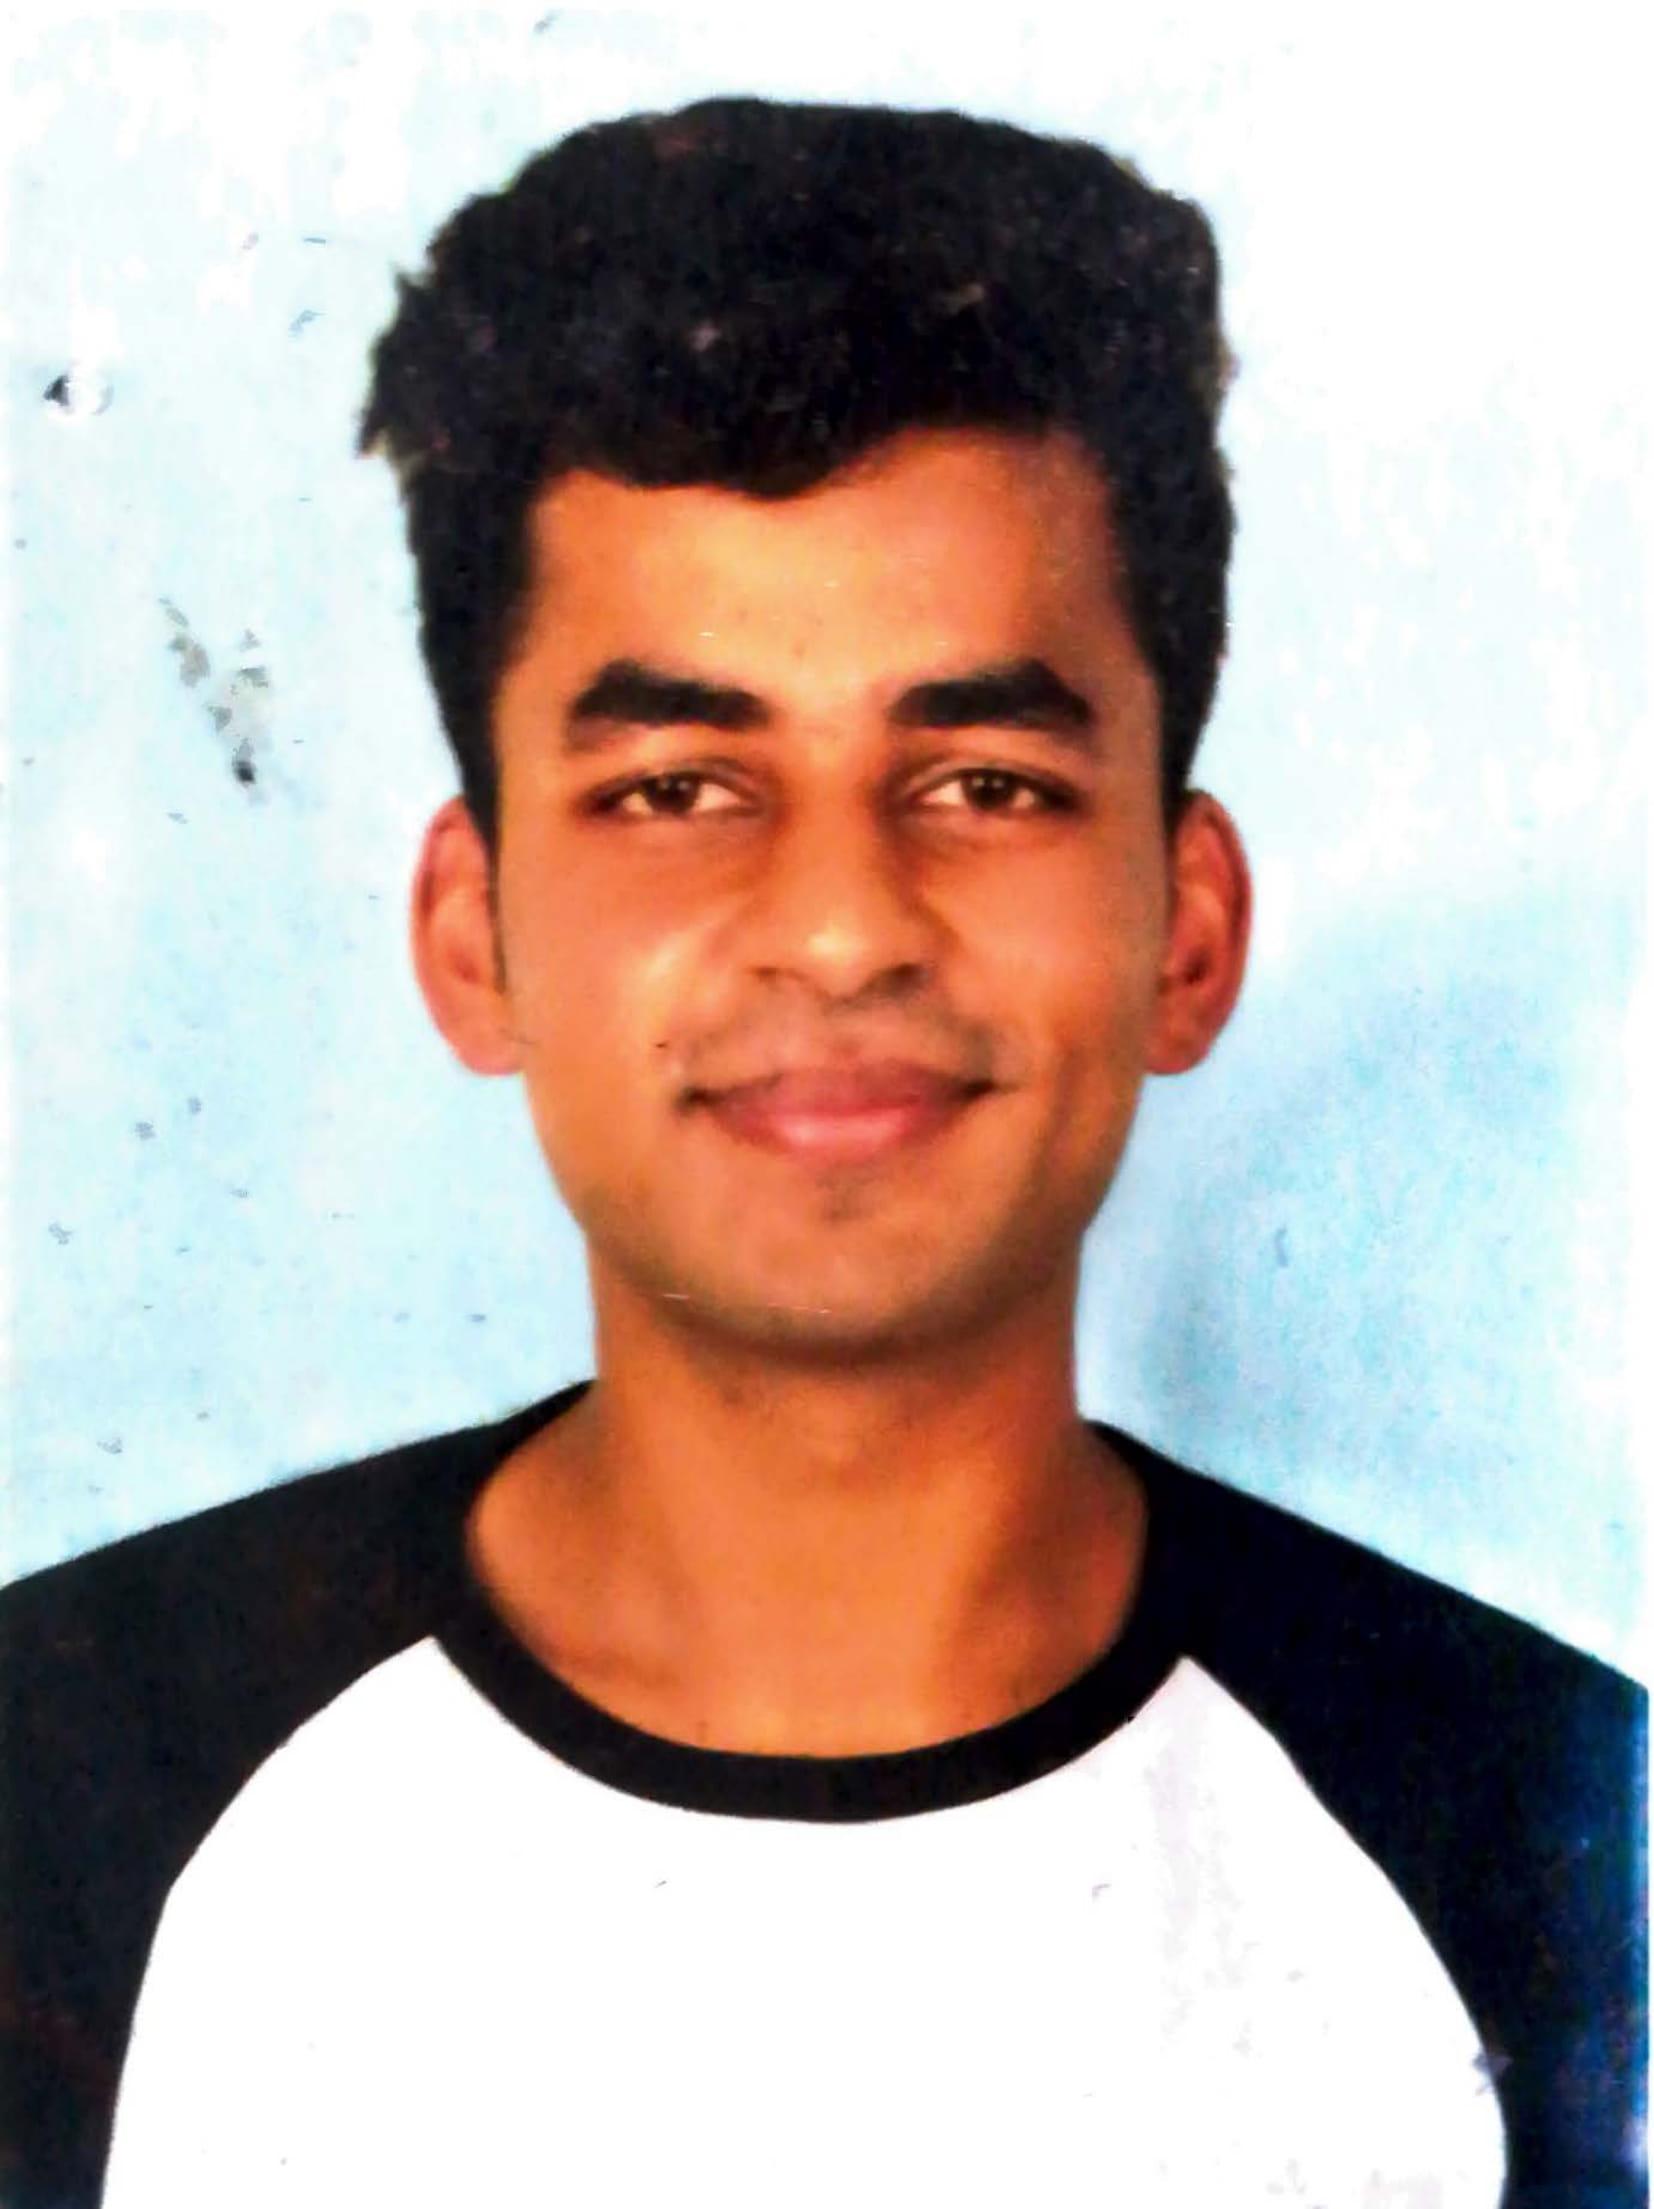 Priyam Dalmia